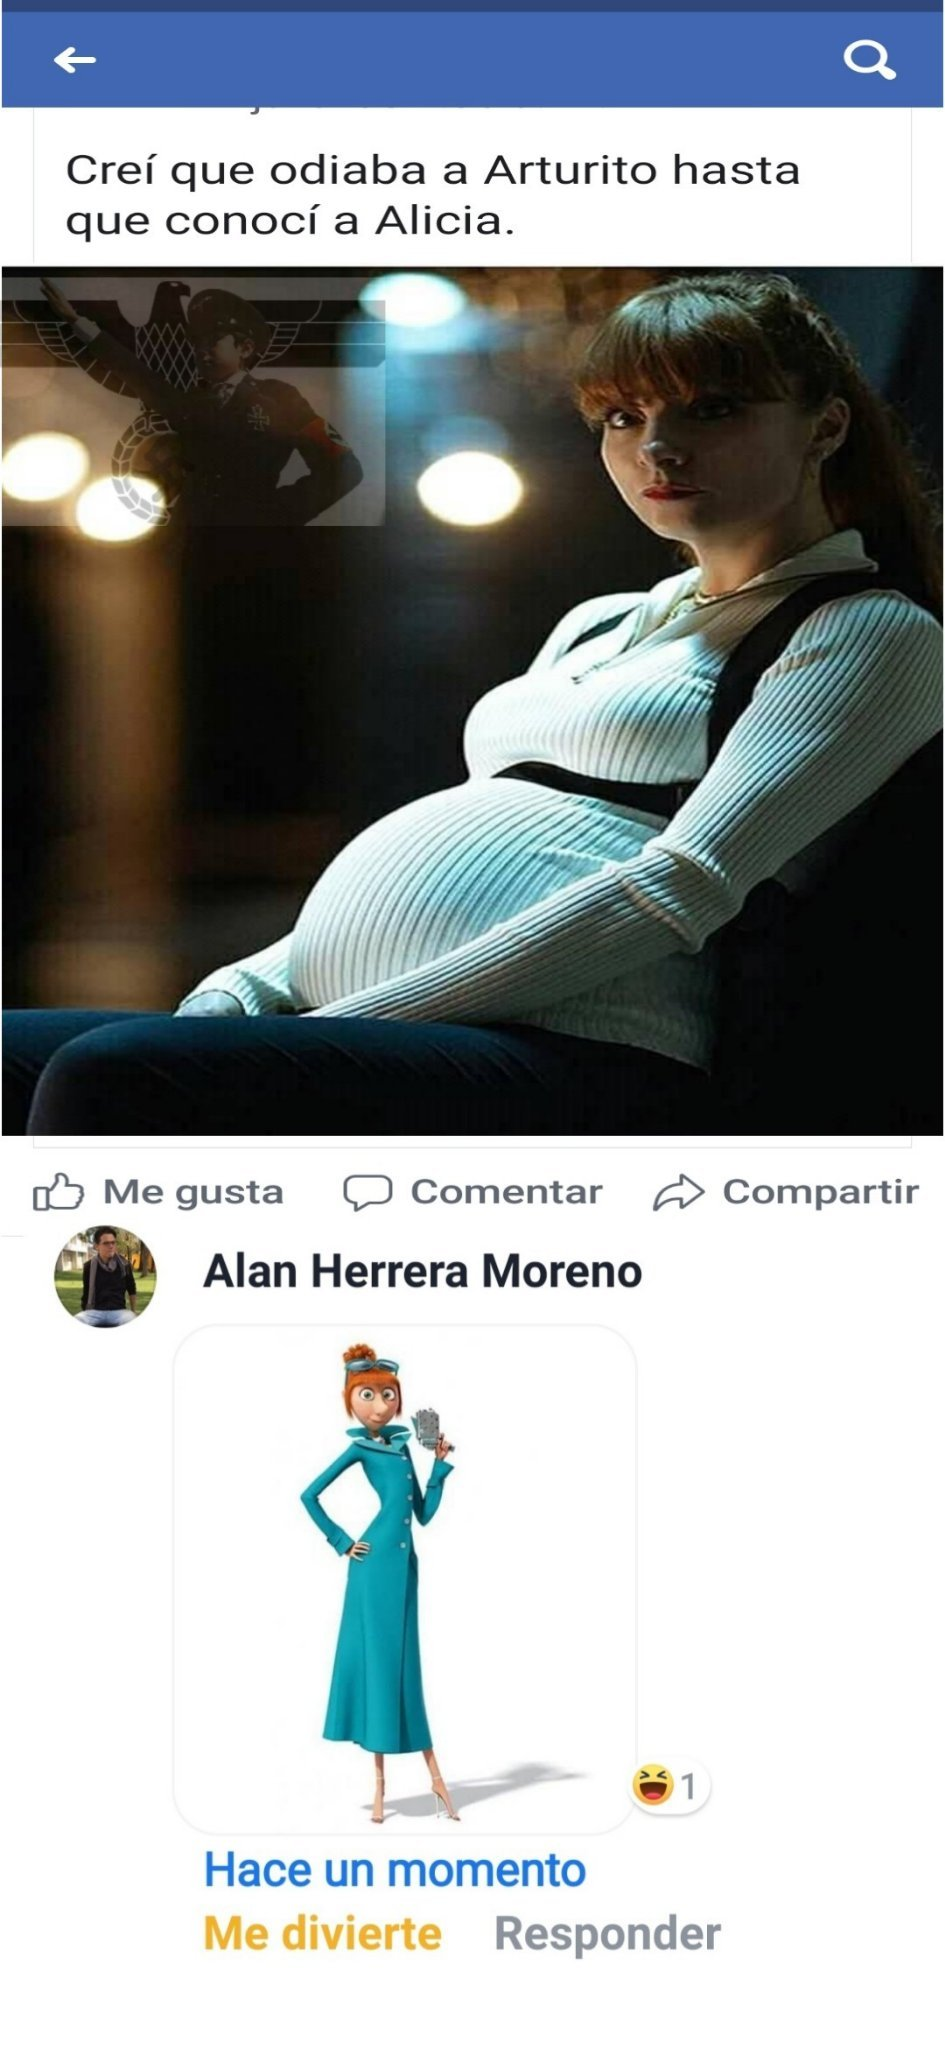 Villaviciosa de córdoba dating app